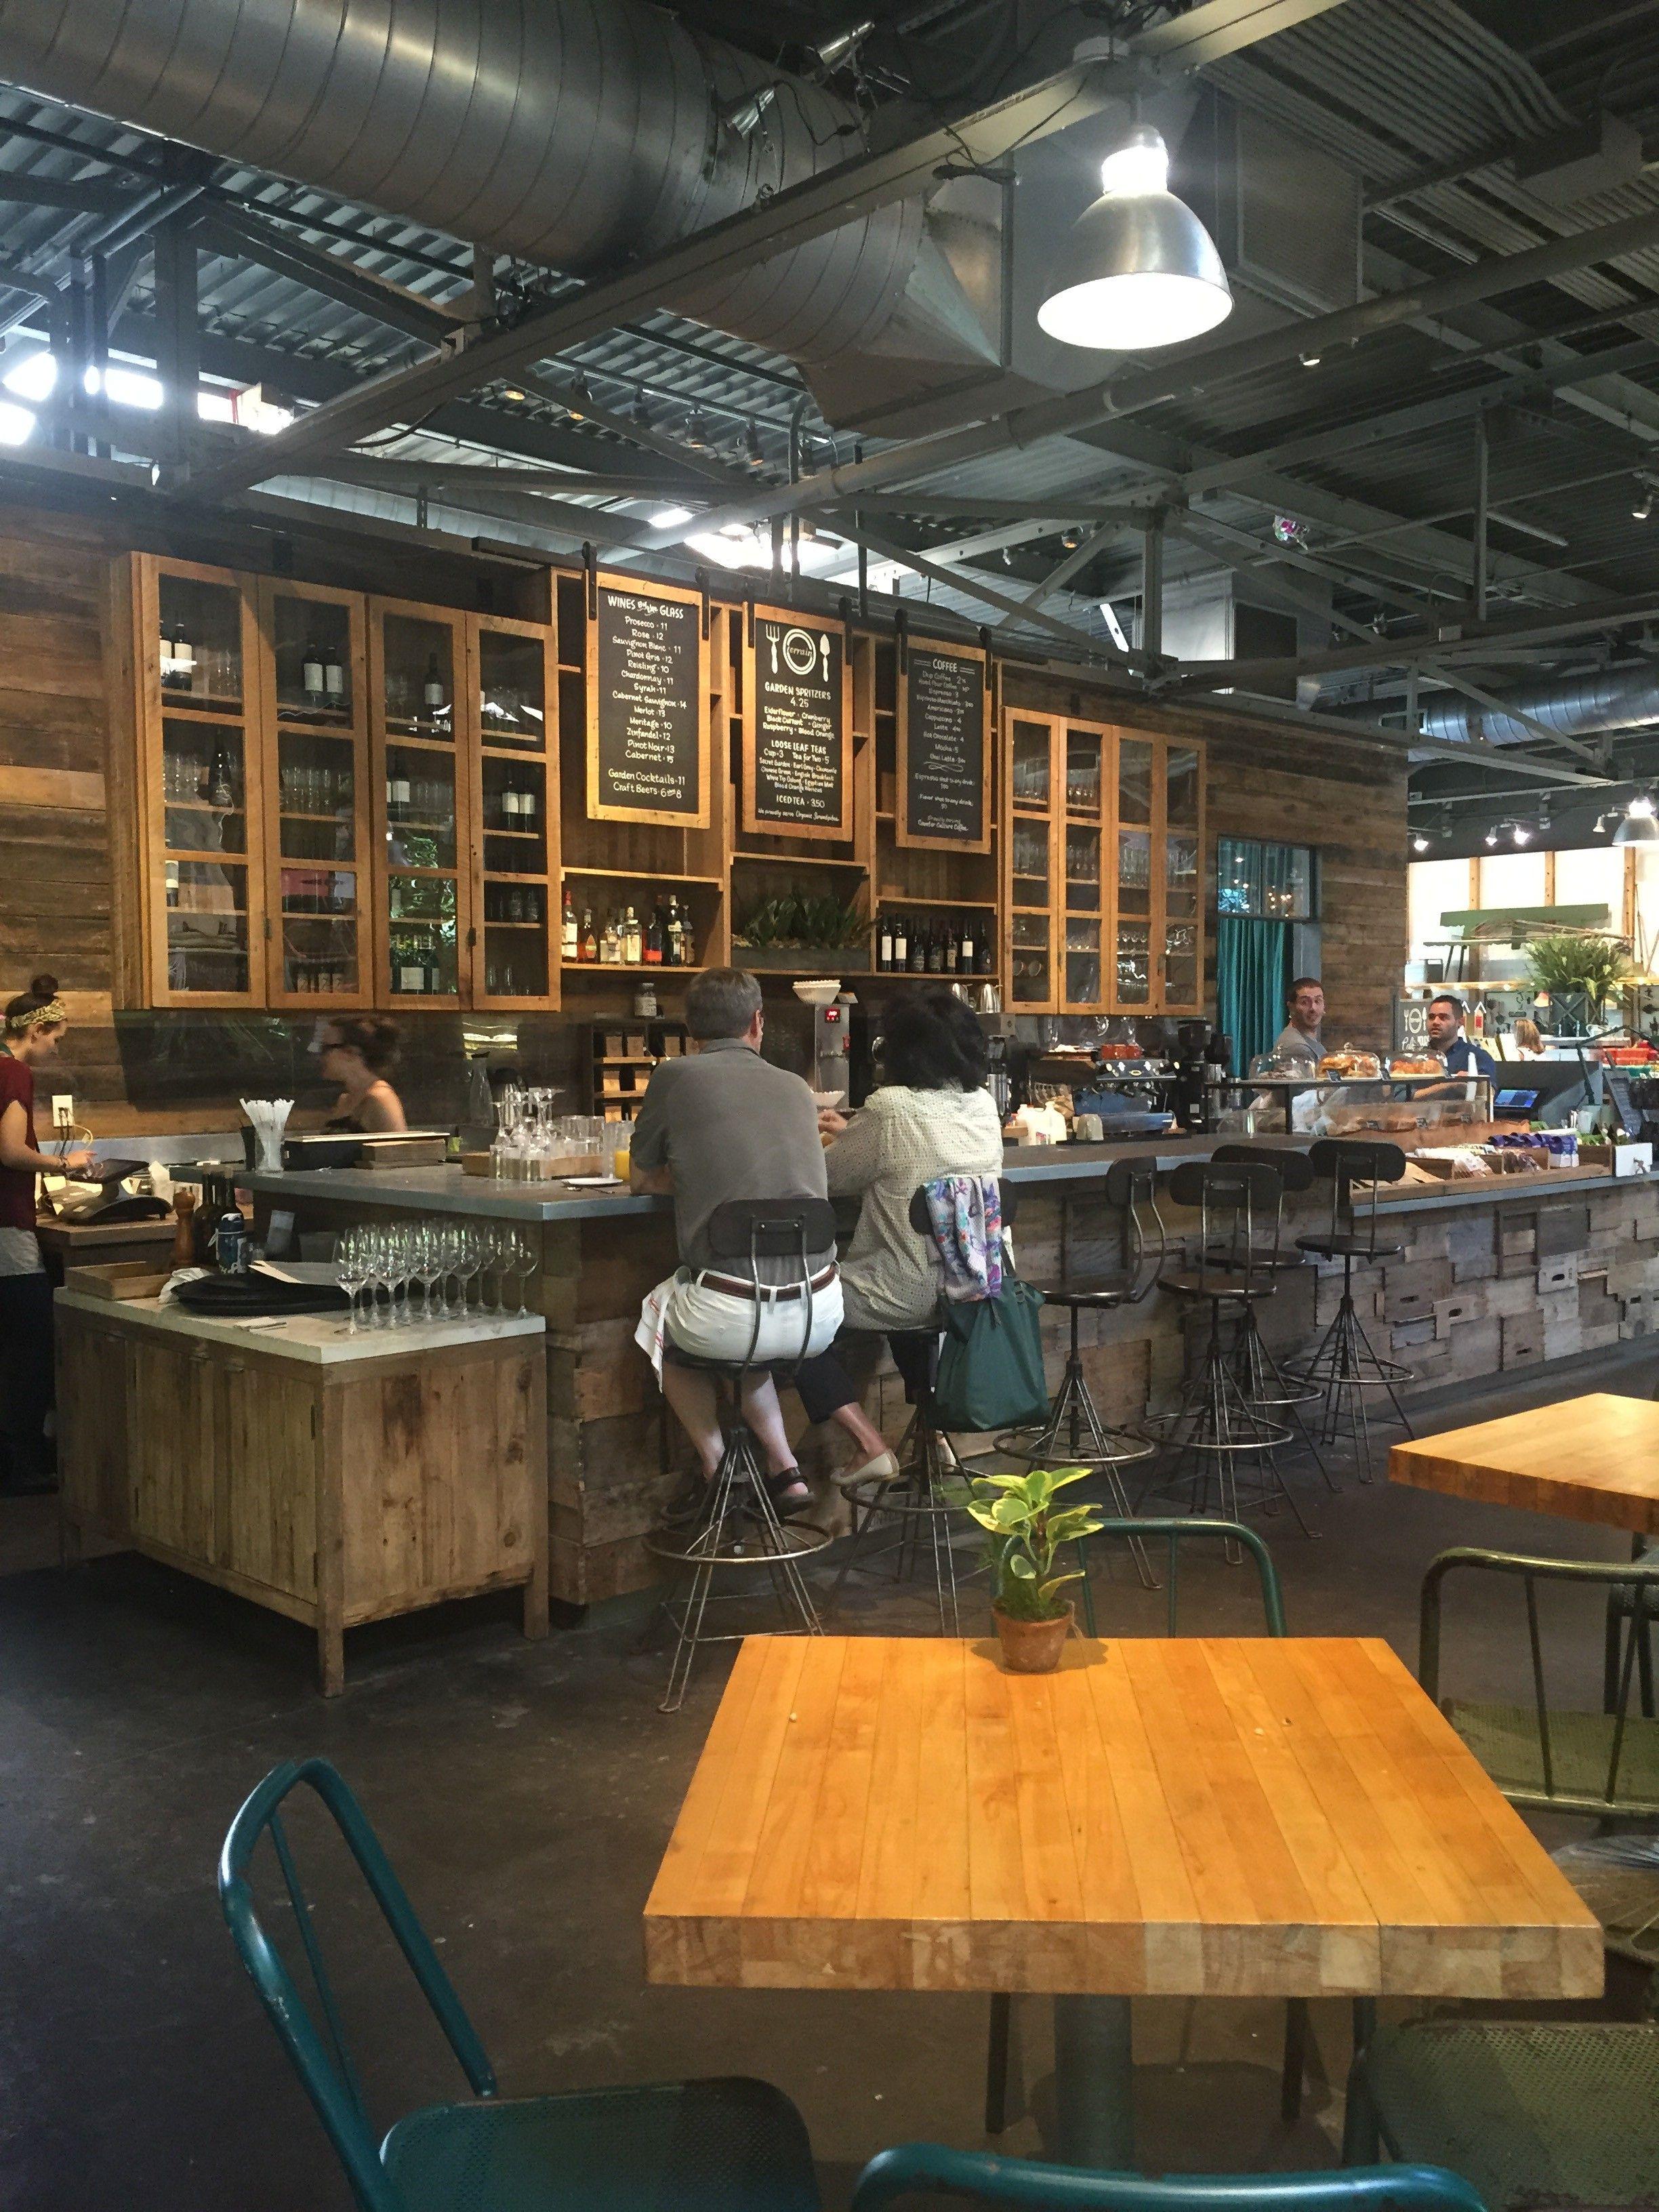 Store Experience Garden Cafe Terrain at Westport, CT